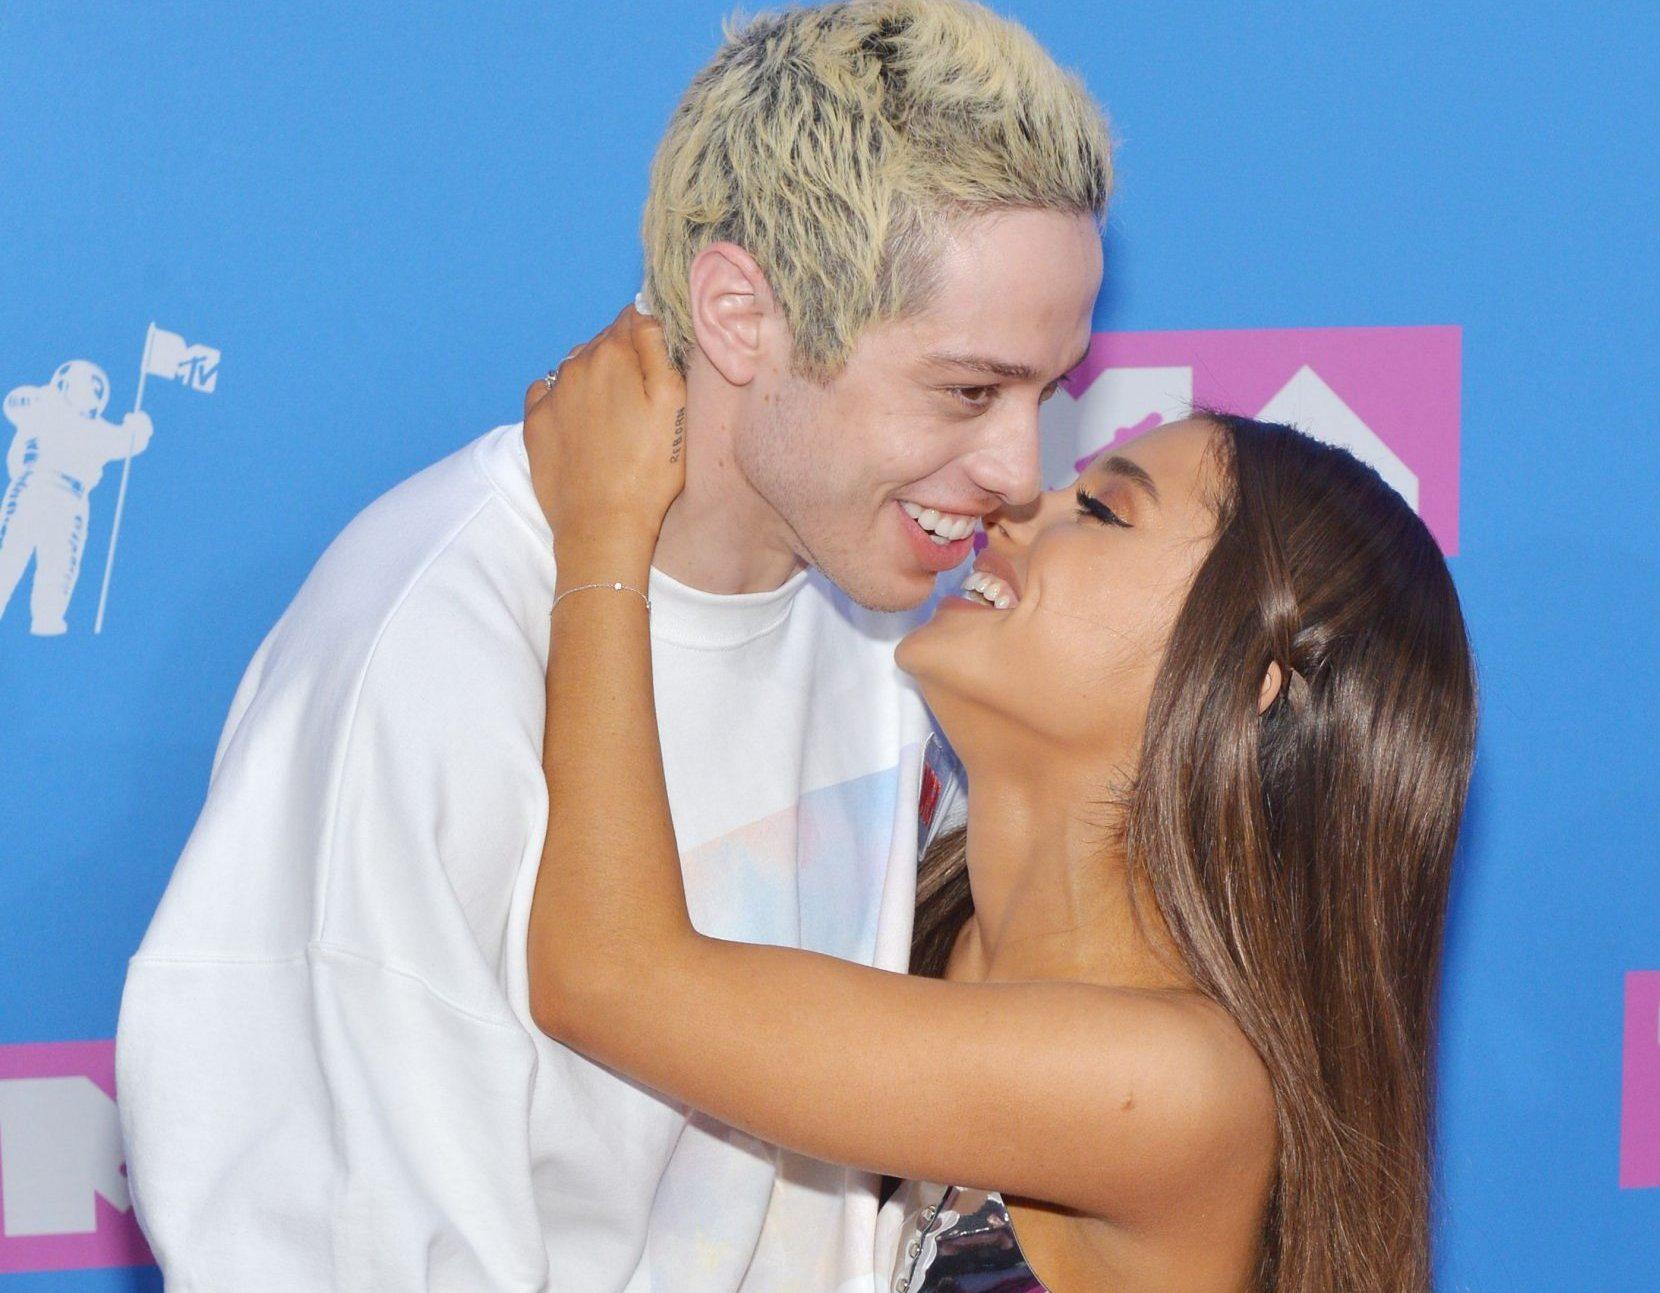 Mandatory Credit: Photo by REX/Shutterstock (9795338z) Pete Davidson and Ariana Grande MTV Video Music Awards, Arrivals, New York, USA - 20 Aug 2018